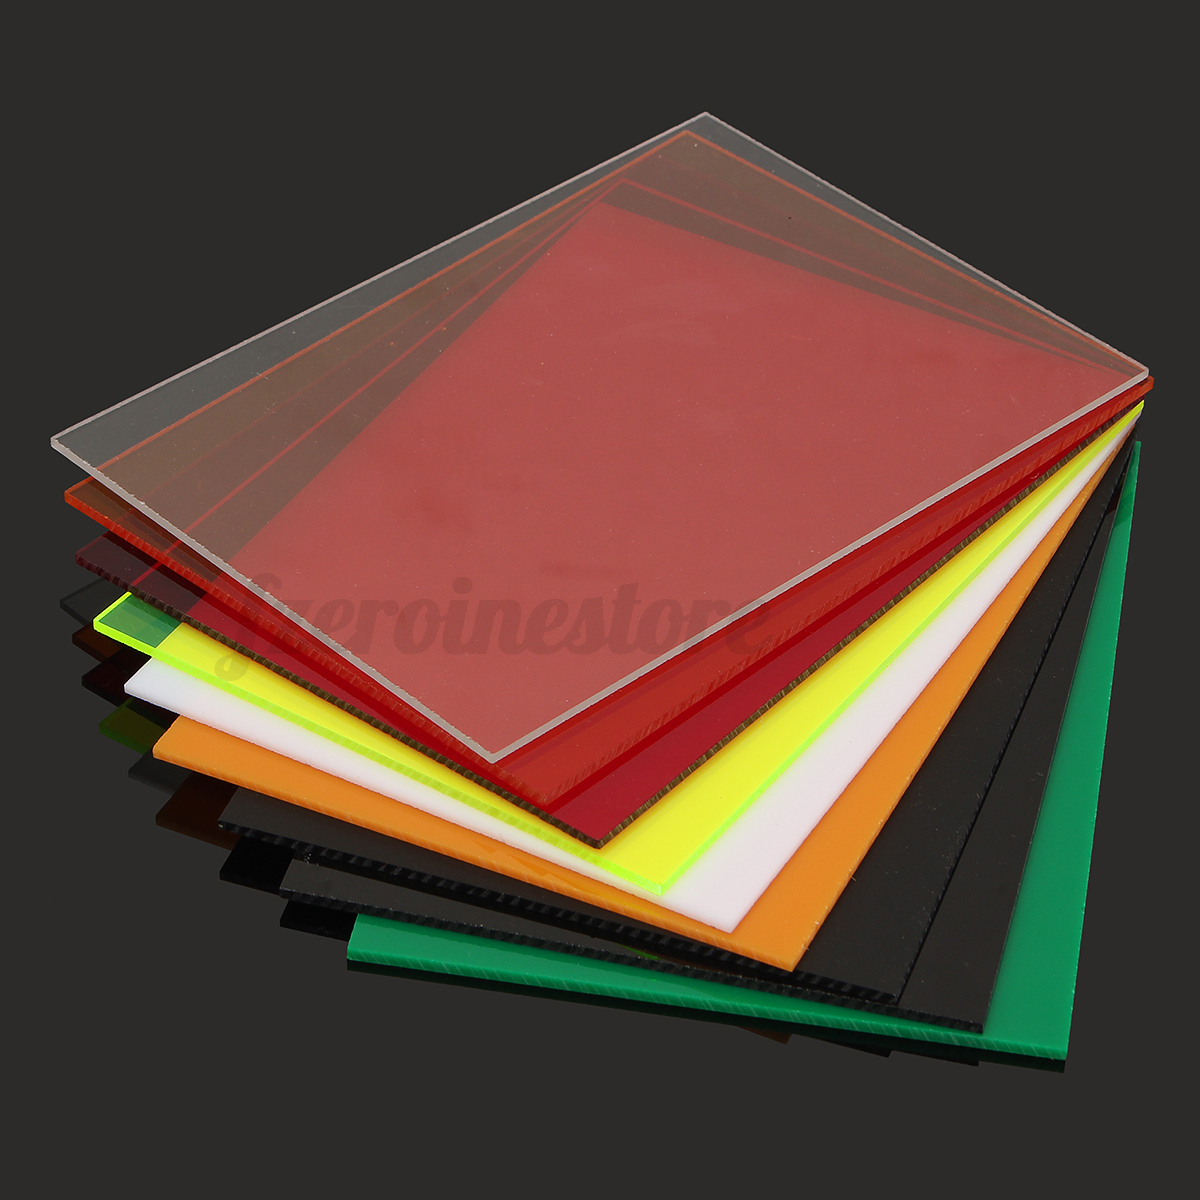 acrylglas plexiglass zuschnitt perspex platte scheibe bunt 3mm versch gr en. Black Bedroom Furniture Sets. Home Design Ideas